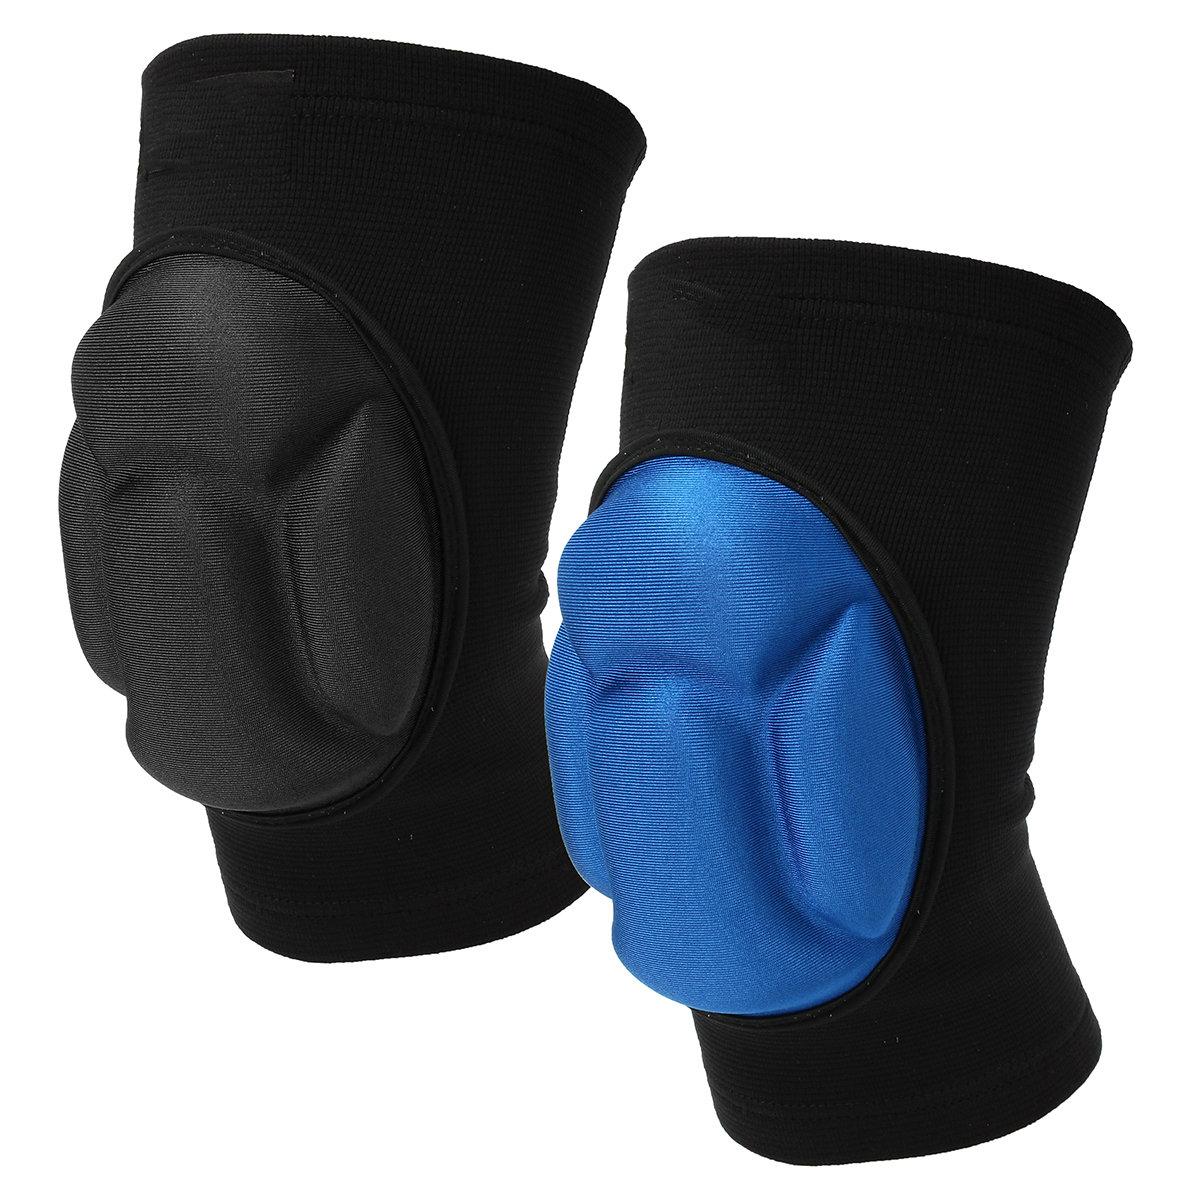 1 Pair Thickening Knee Pad Sports Anti-Collision Kneeling Knee Protect Pads Knee Brace Protector